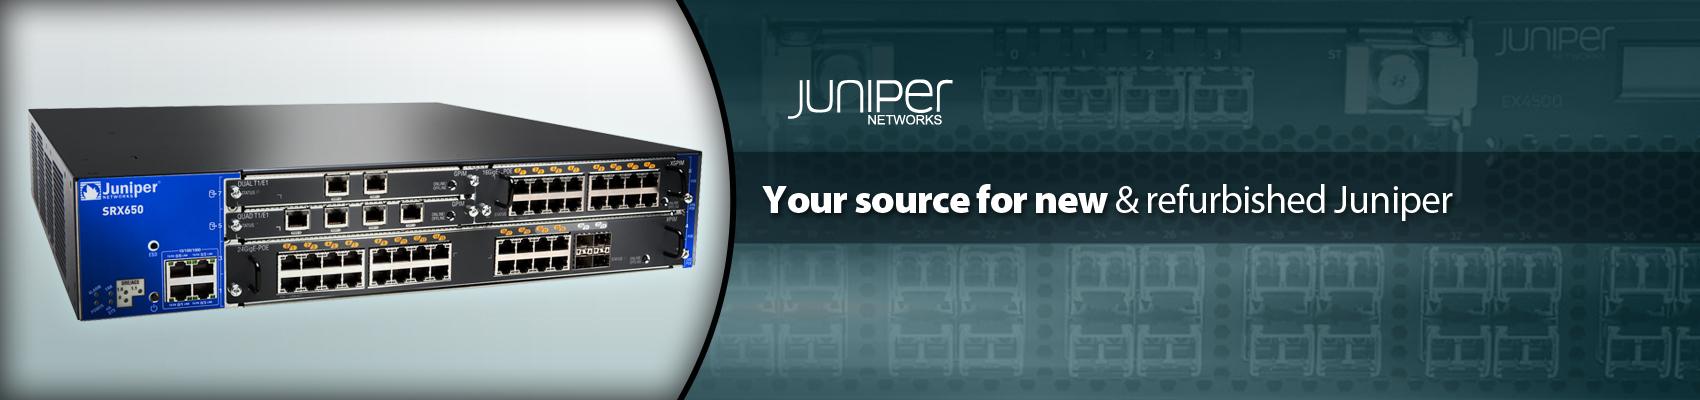 NetworkCrazeJuniper400-1